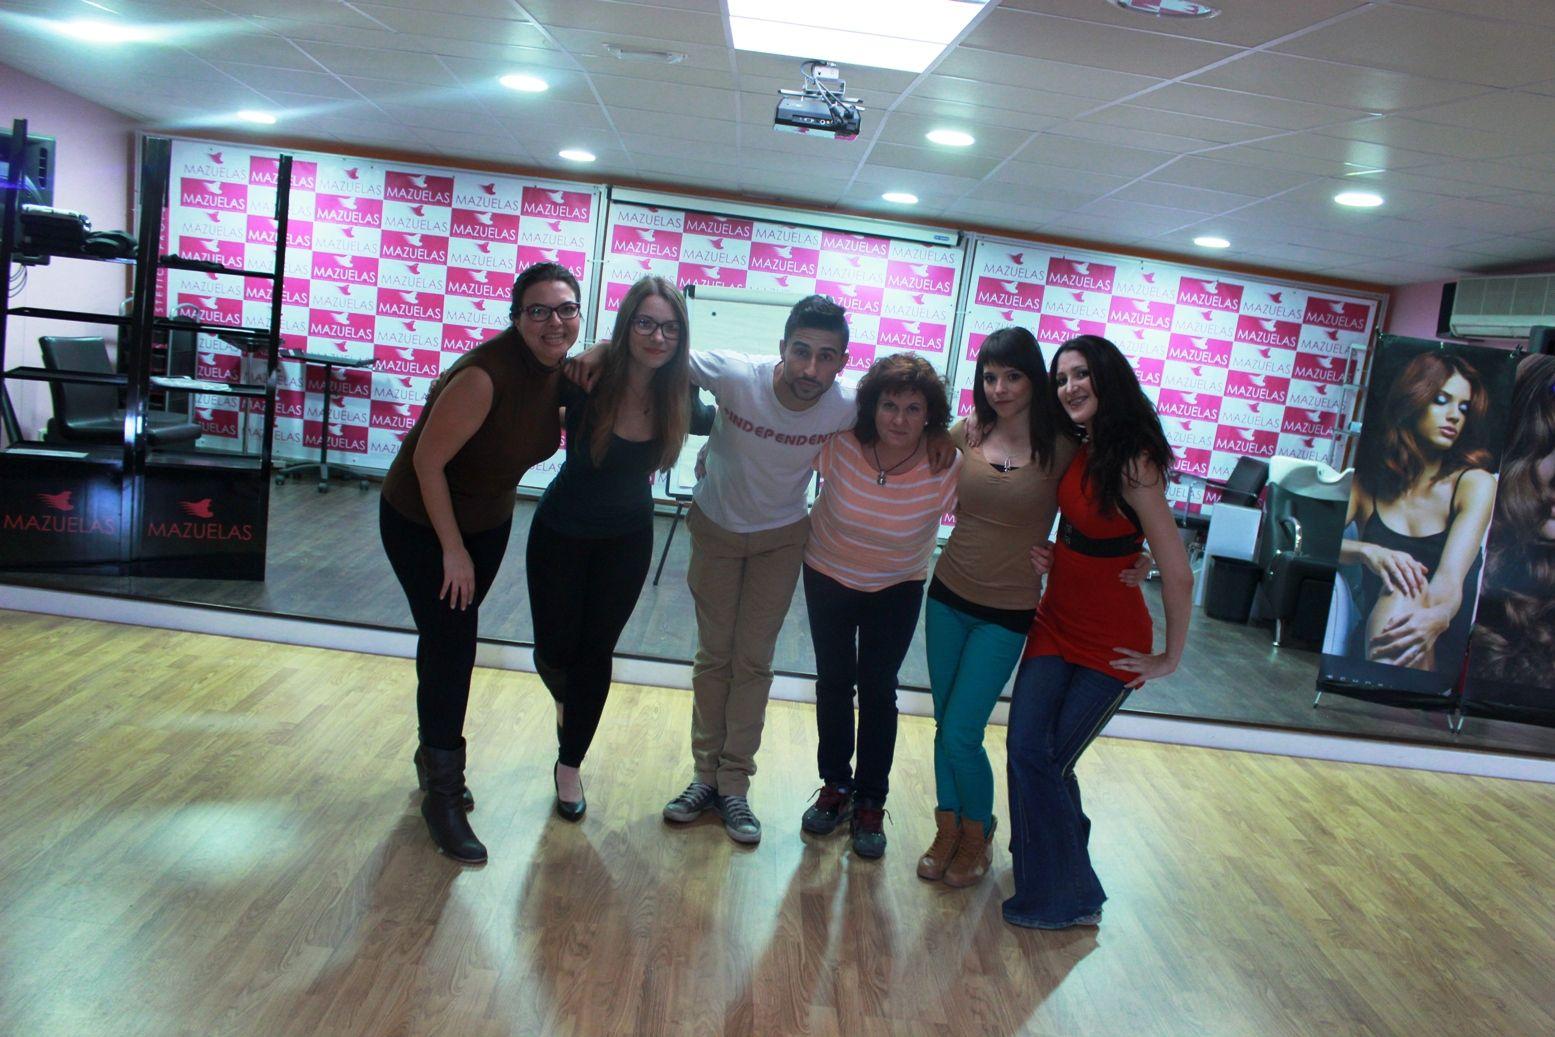 El Equipo Flashmob ya está listo - Flashmob #maquillaje